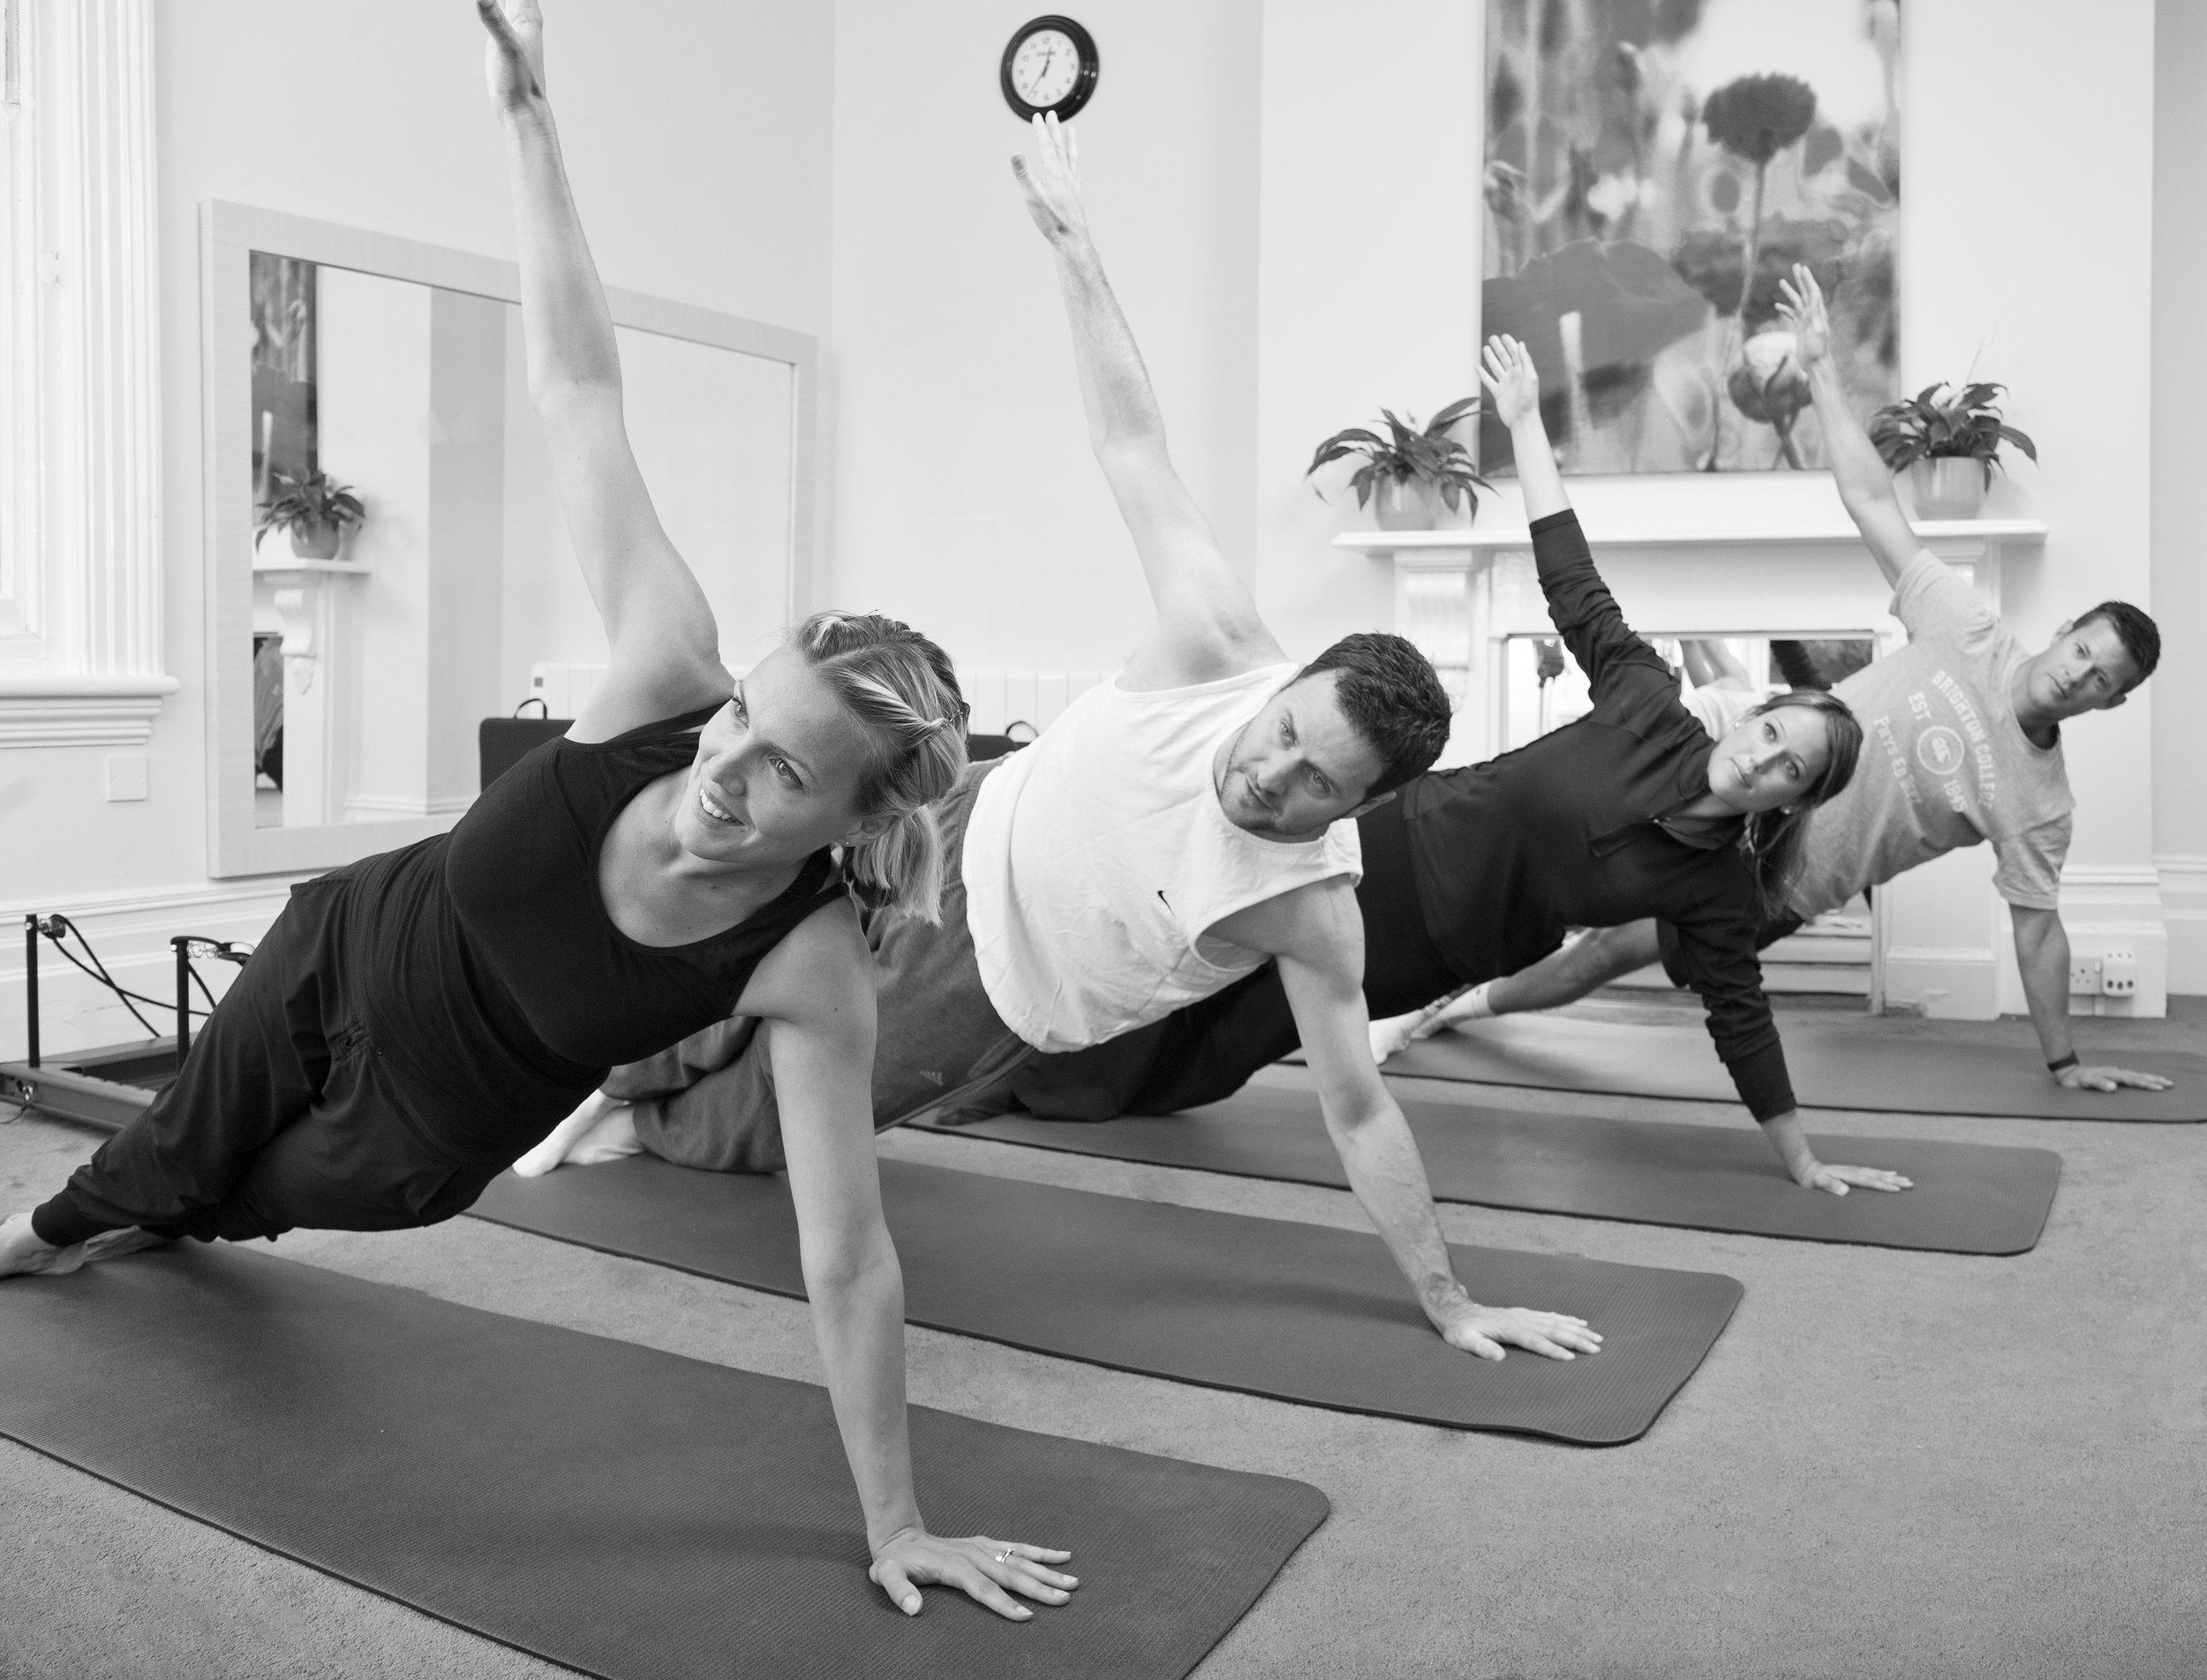 pilates plank.jpg